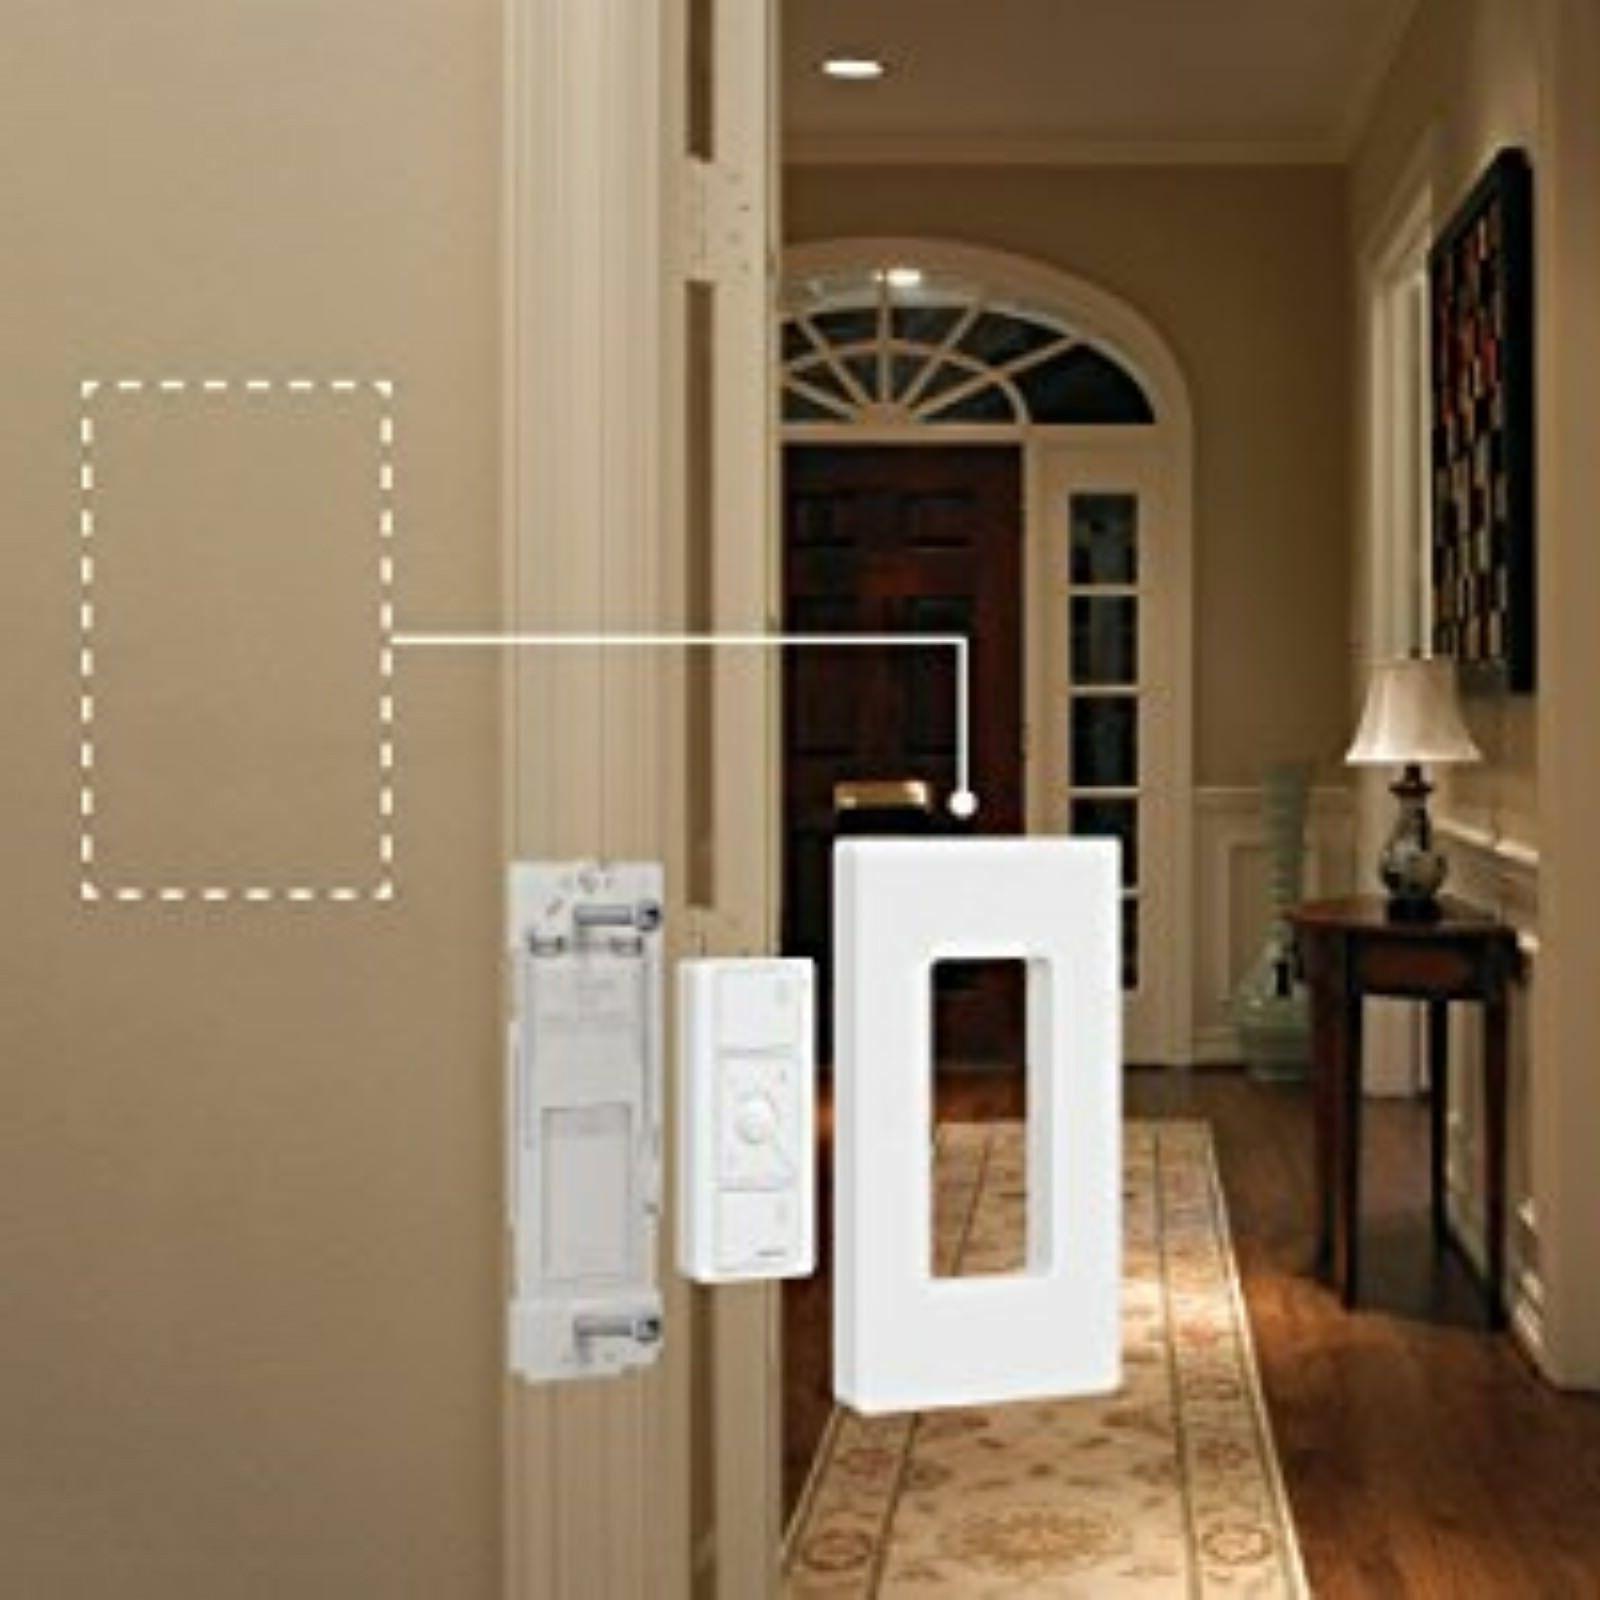 Wallplate Caseta Wireless Plug-In